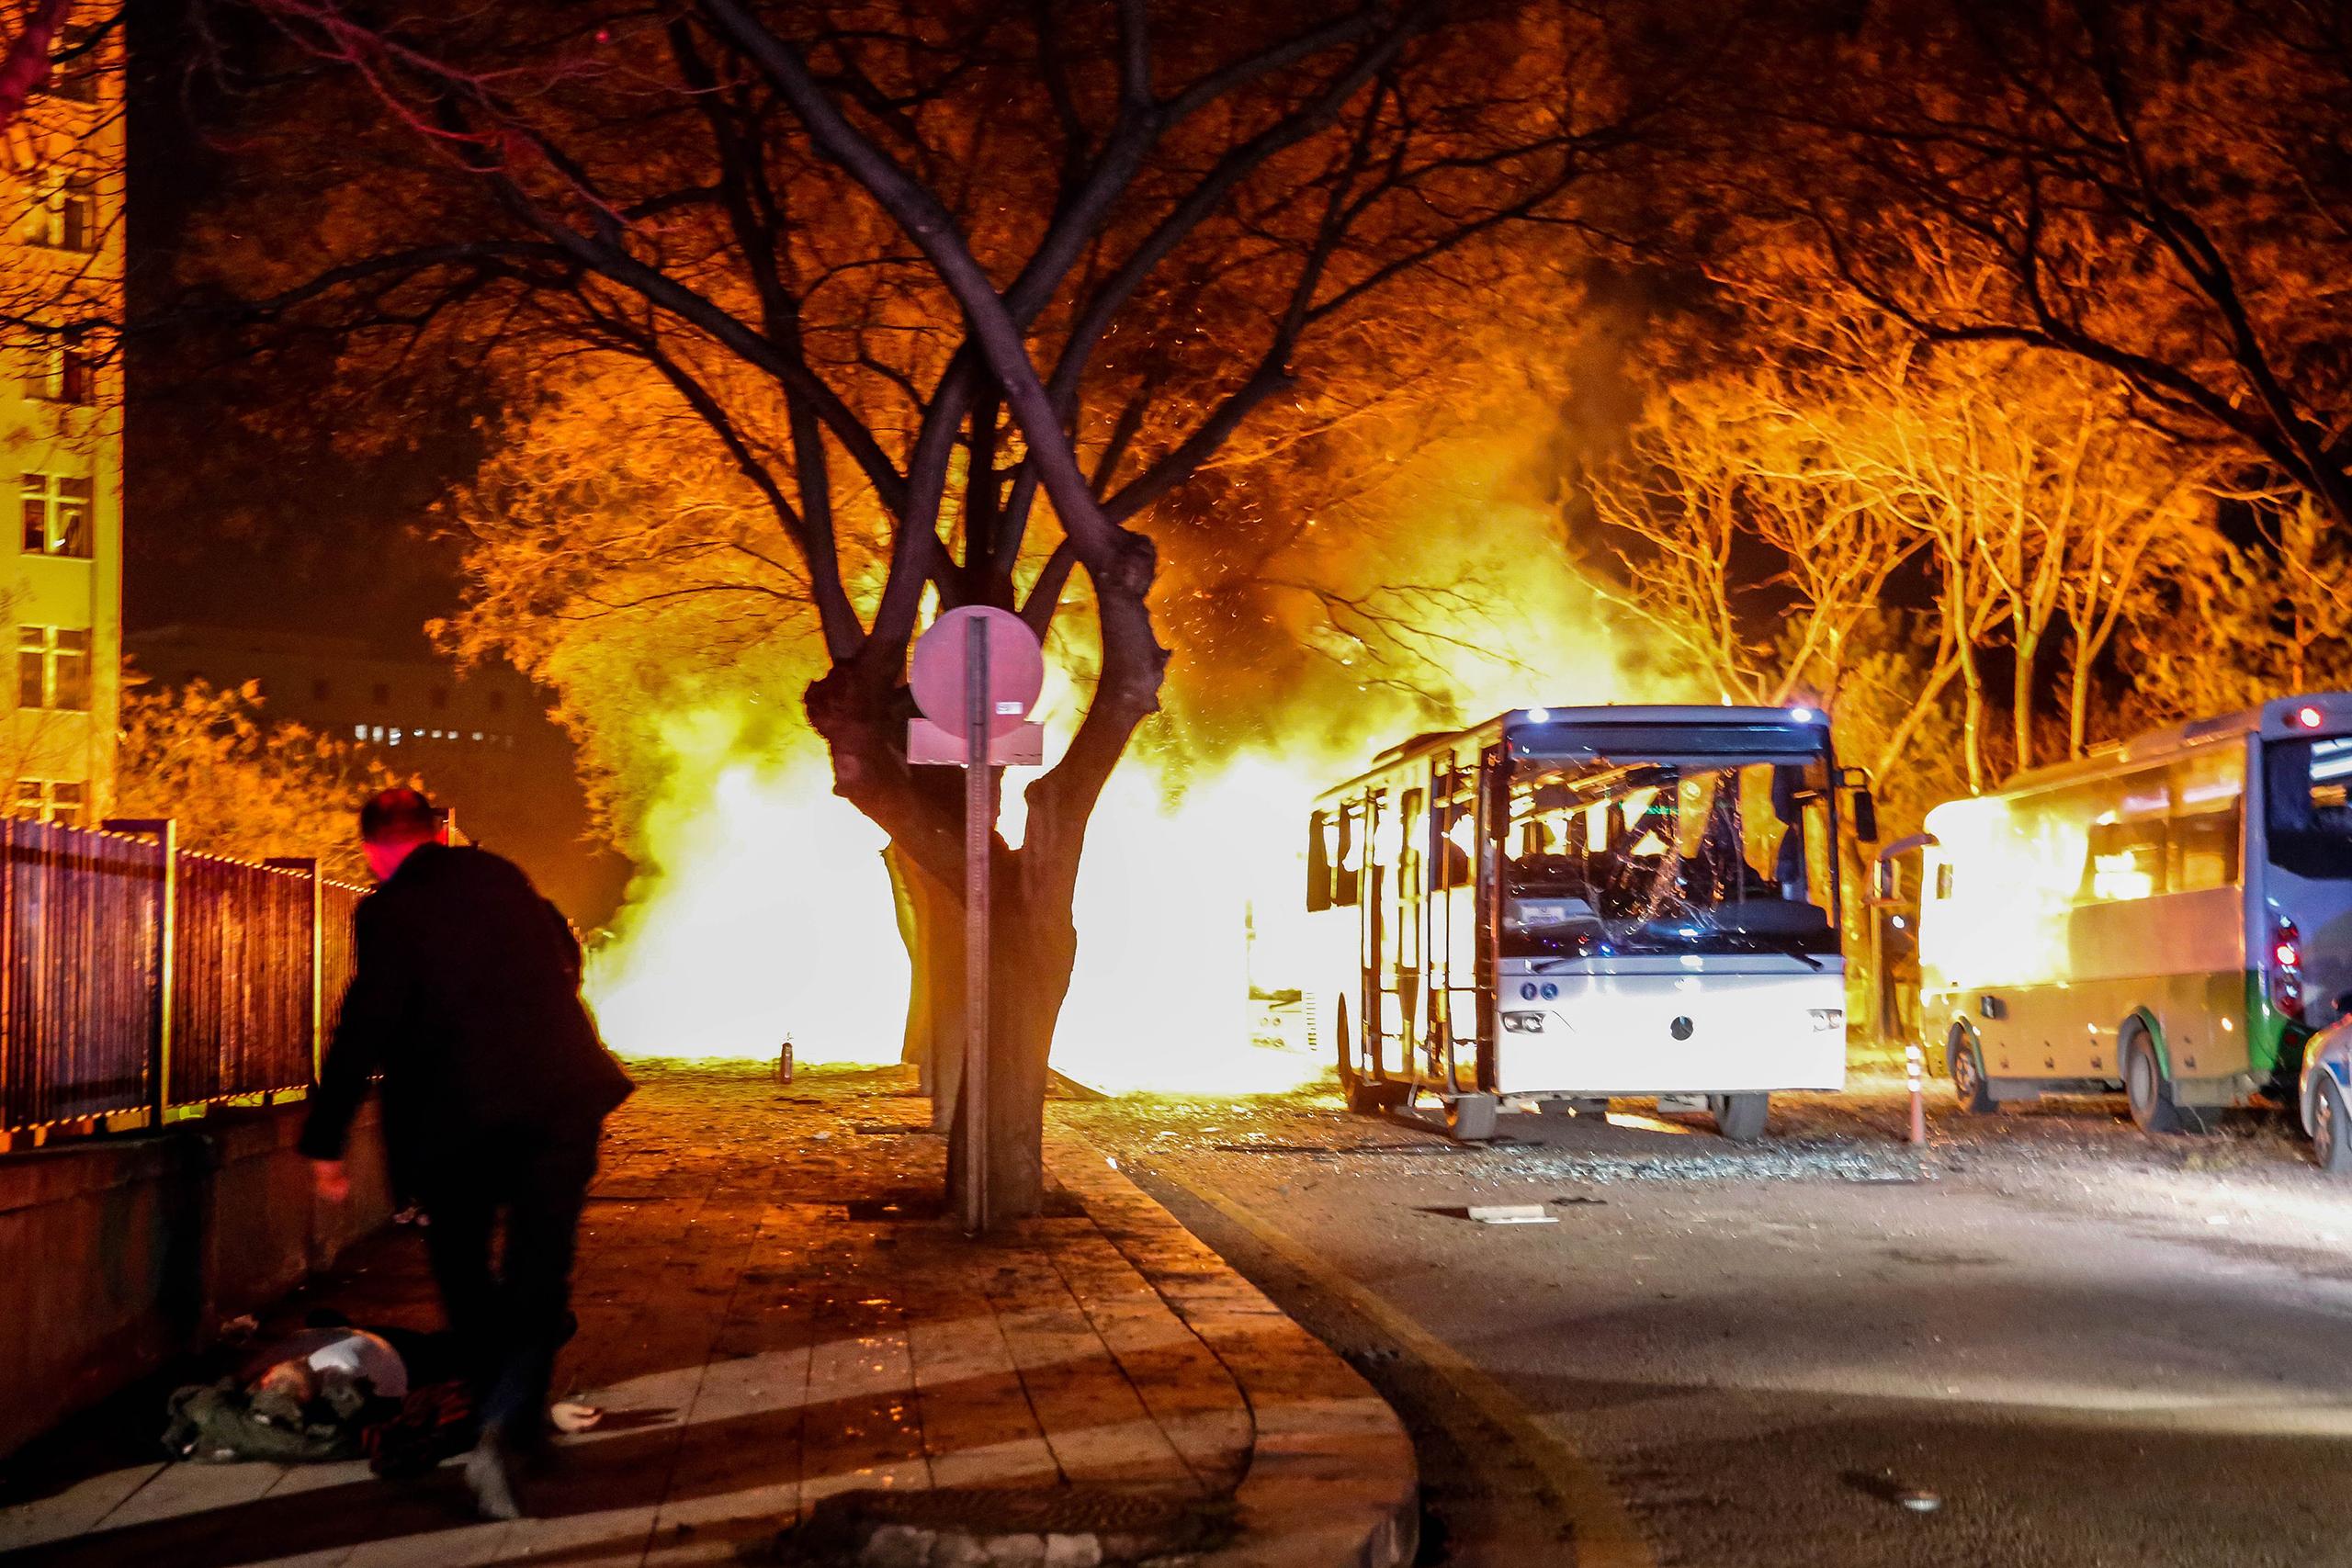 Army service buses burn after an explosion in Ankara, Turkey, Feb. 17, 2016.